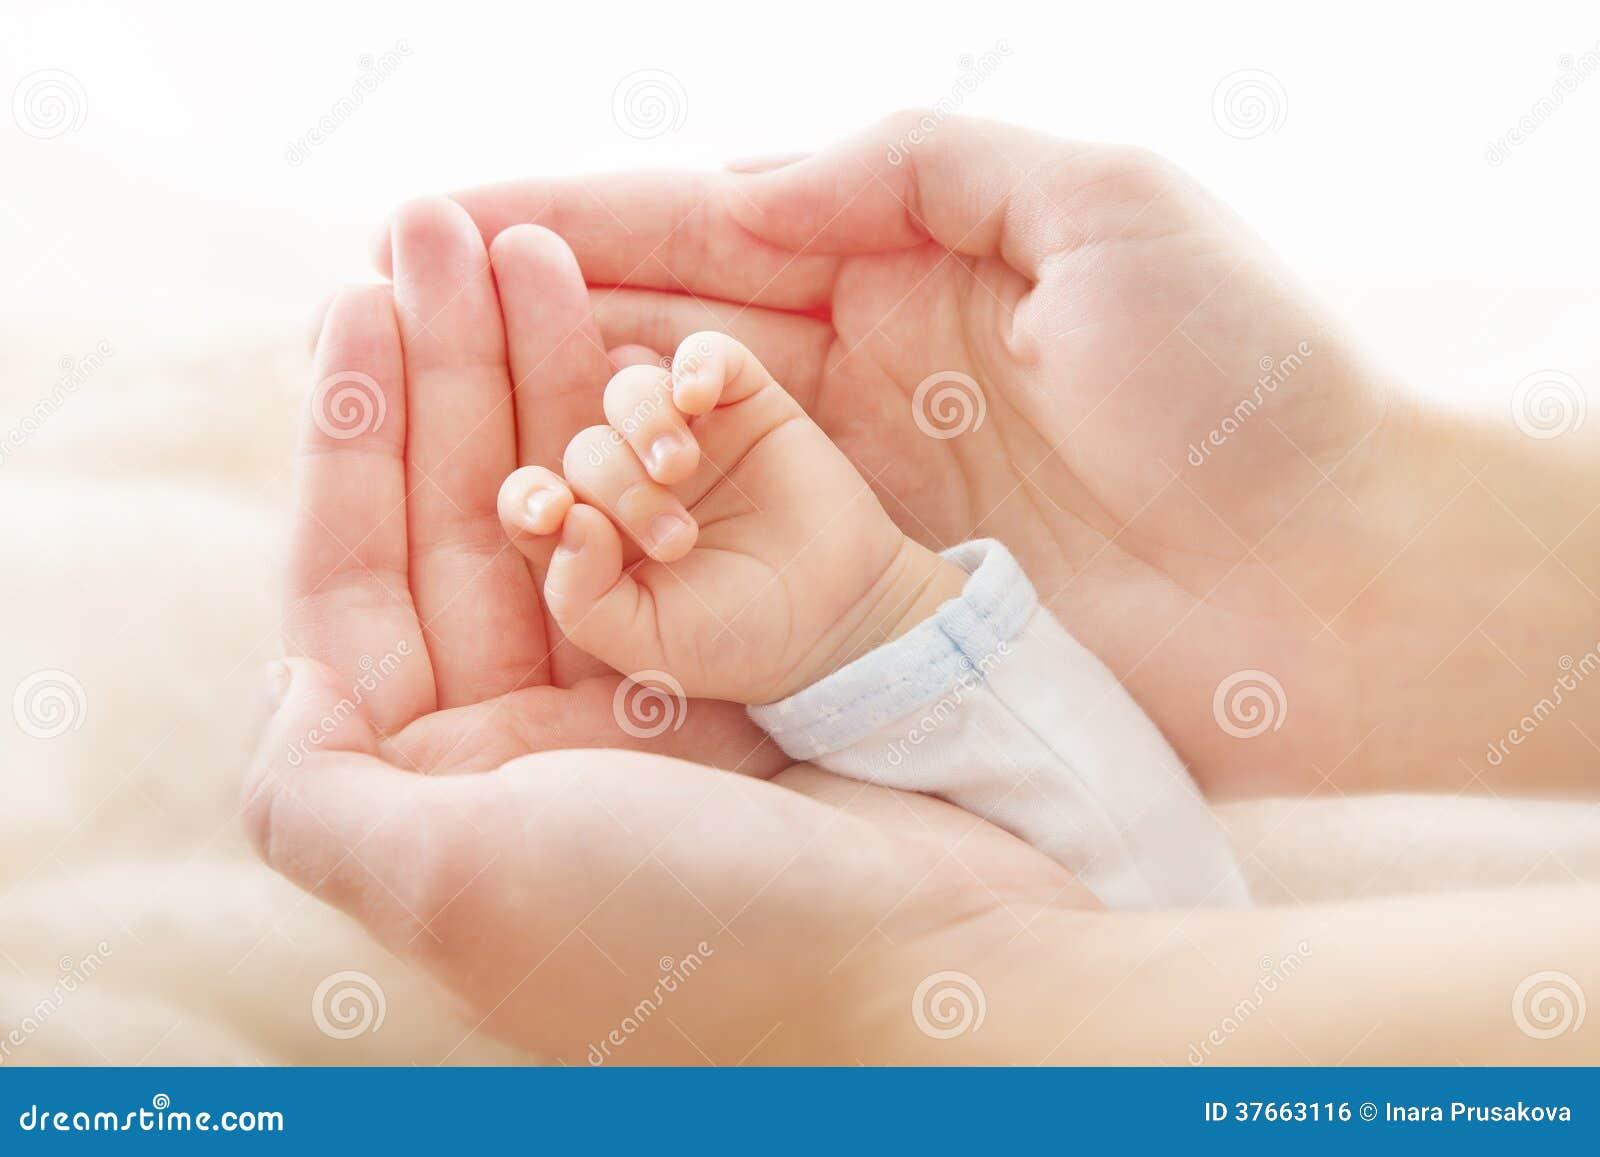 Newborn рука младенца в руках матери. Концепция asistance помощи